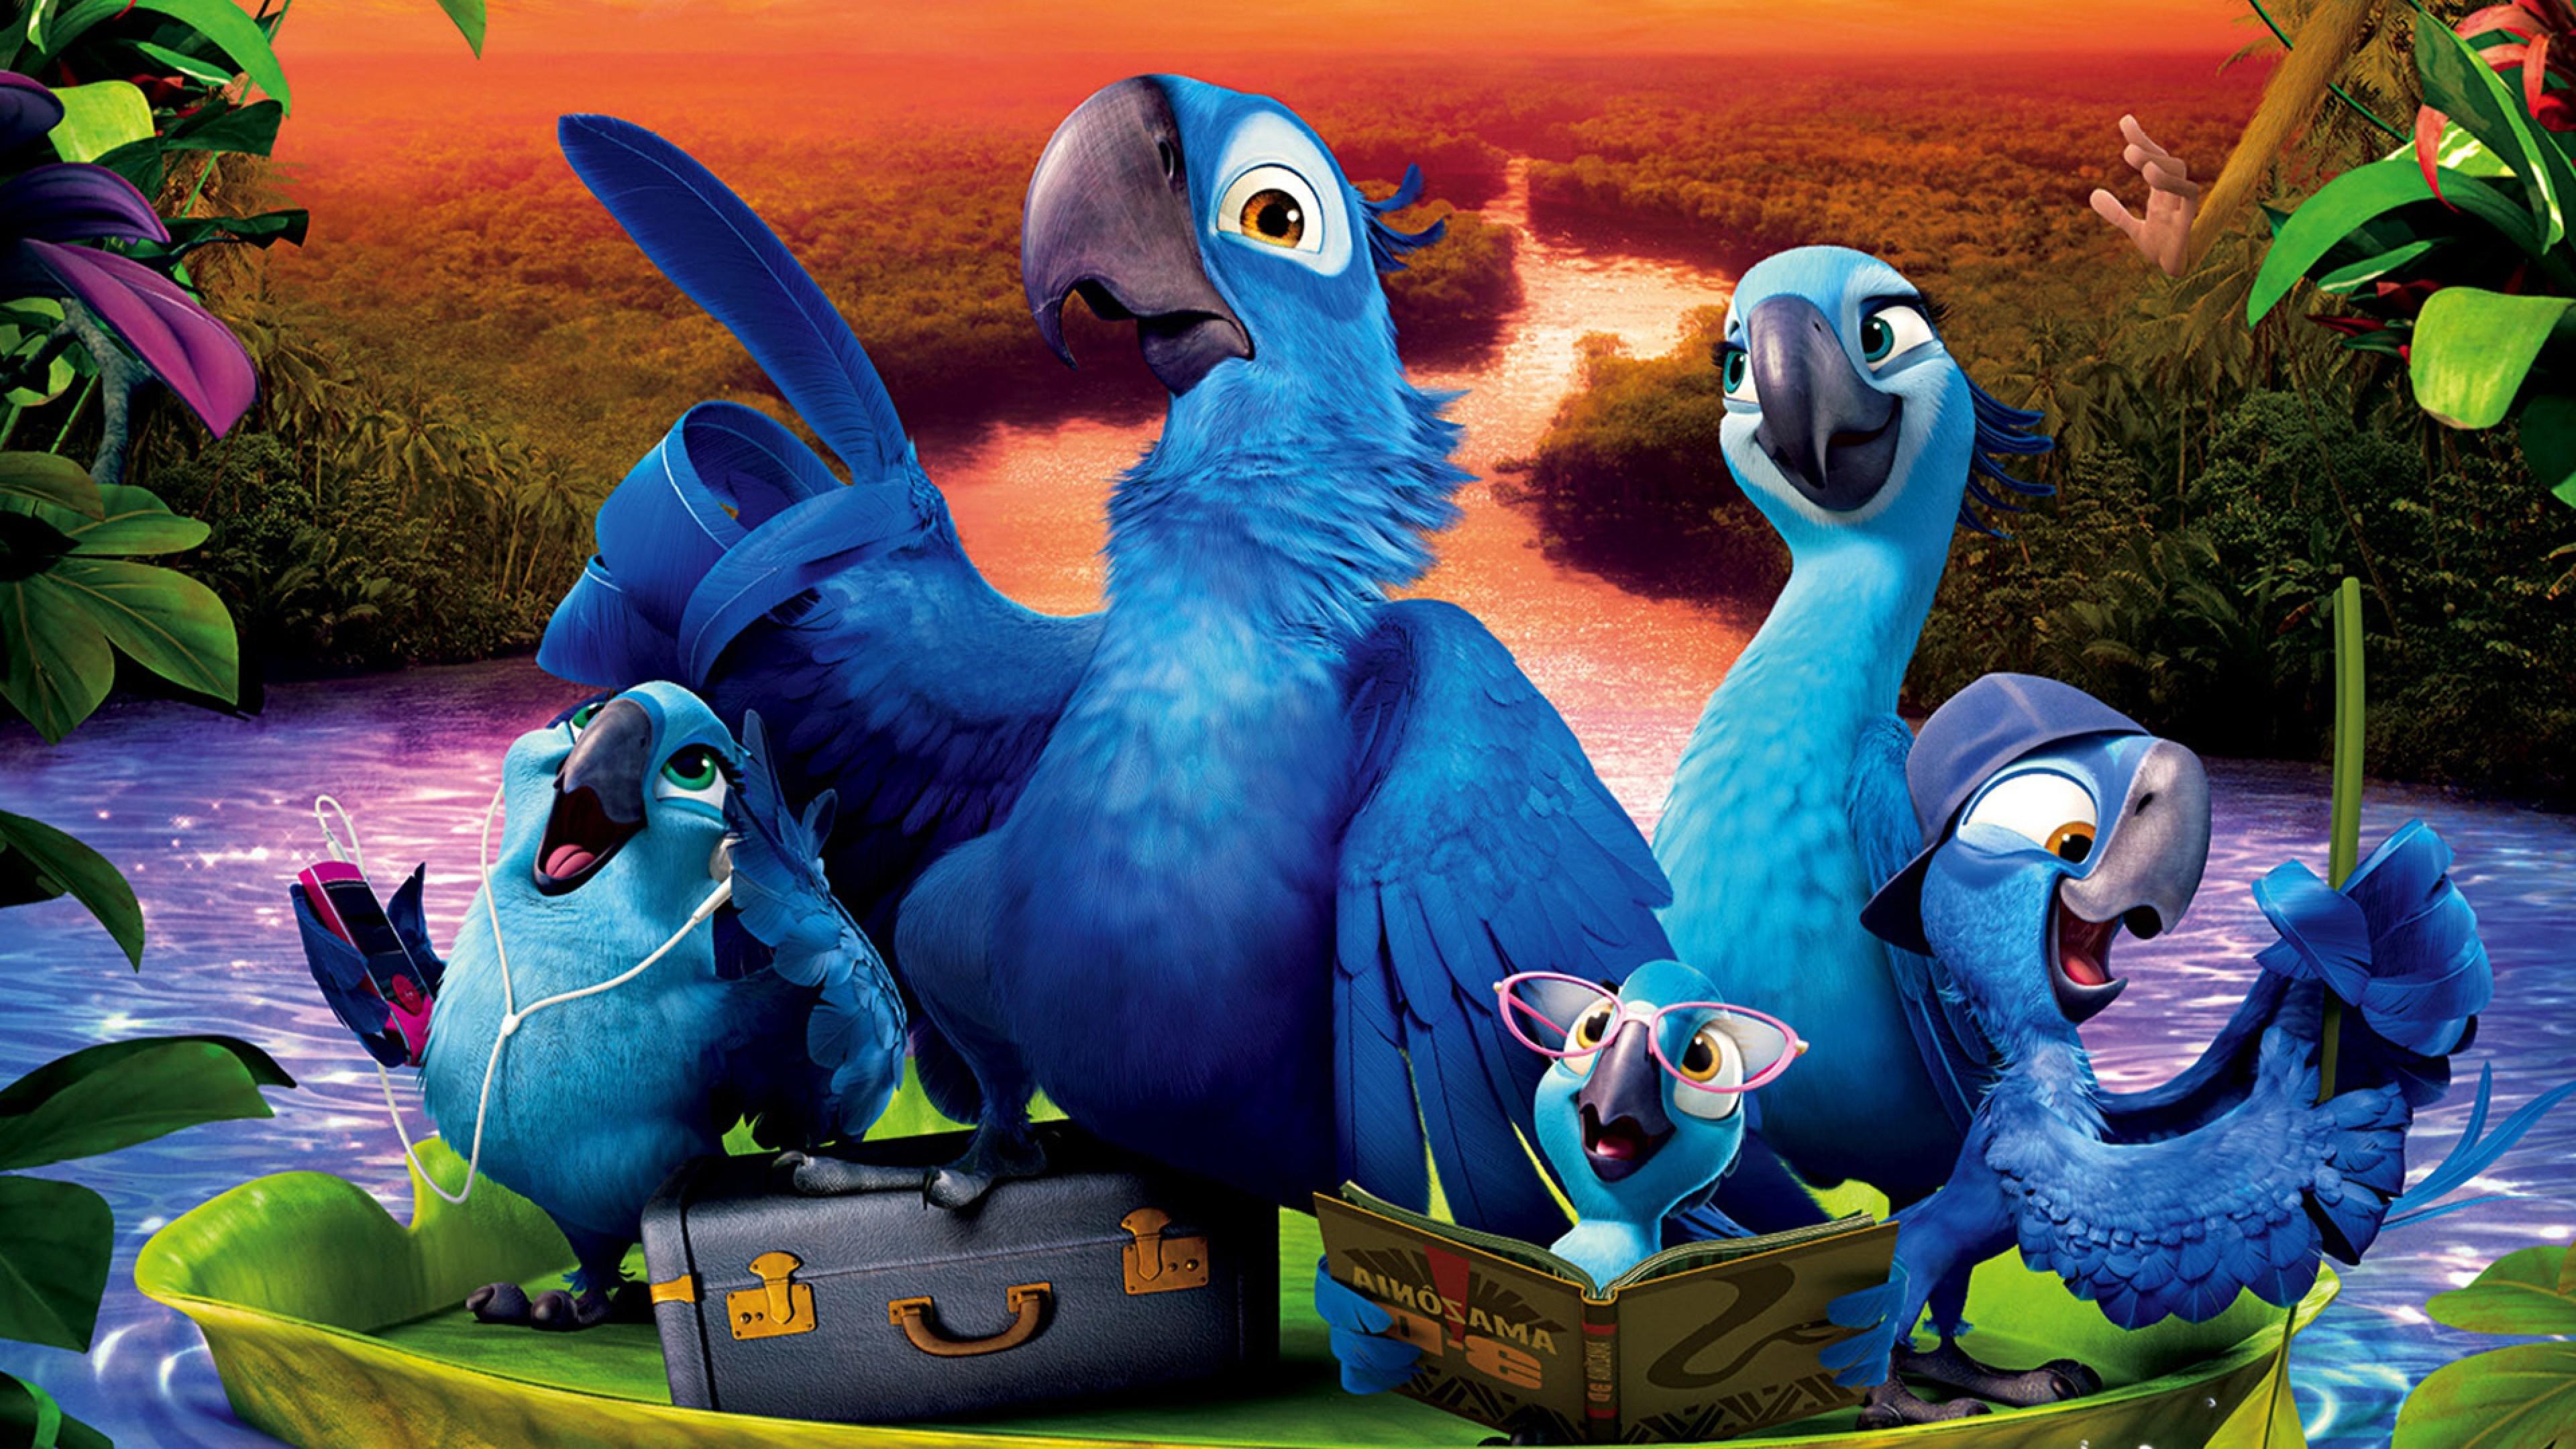 Rio 2 movie hd movies 4k wallpapers images backgrounds photos rio 2 movie voltagebd Choice Image